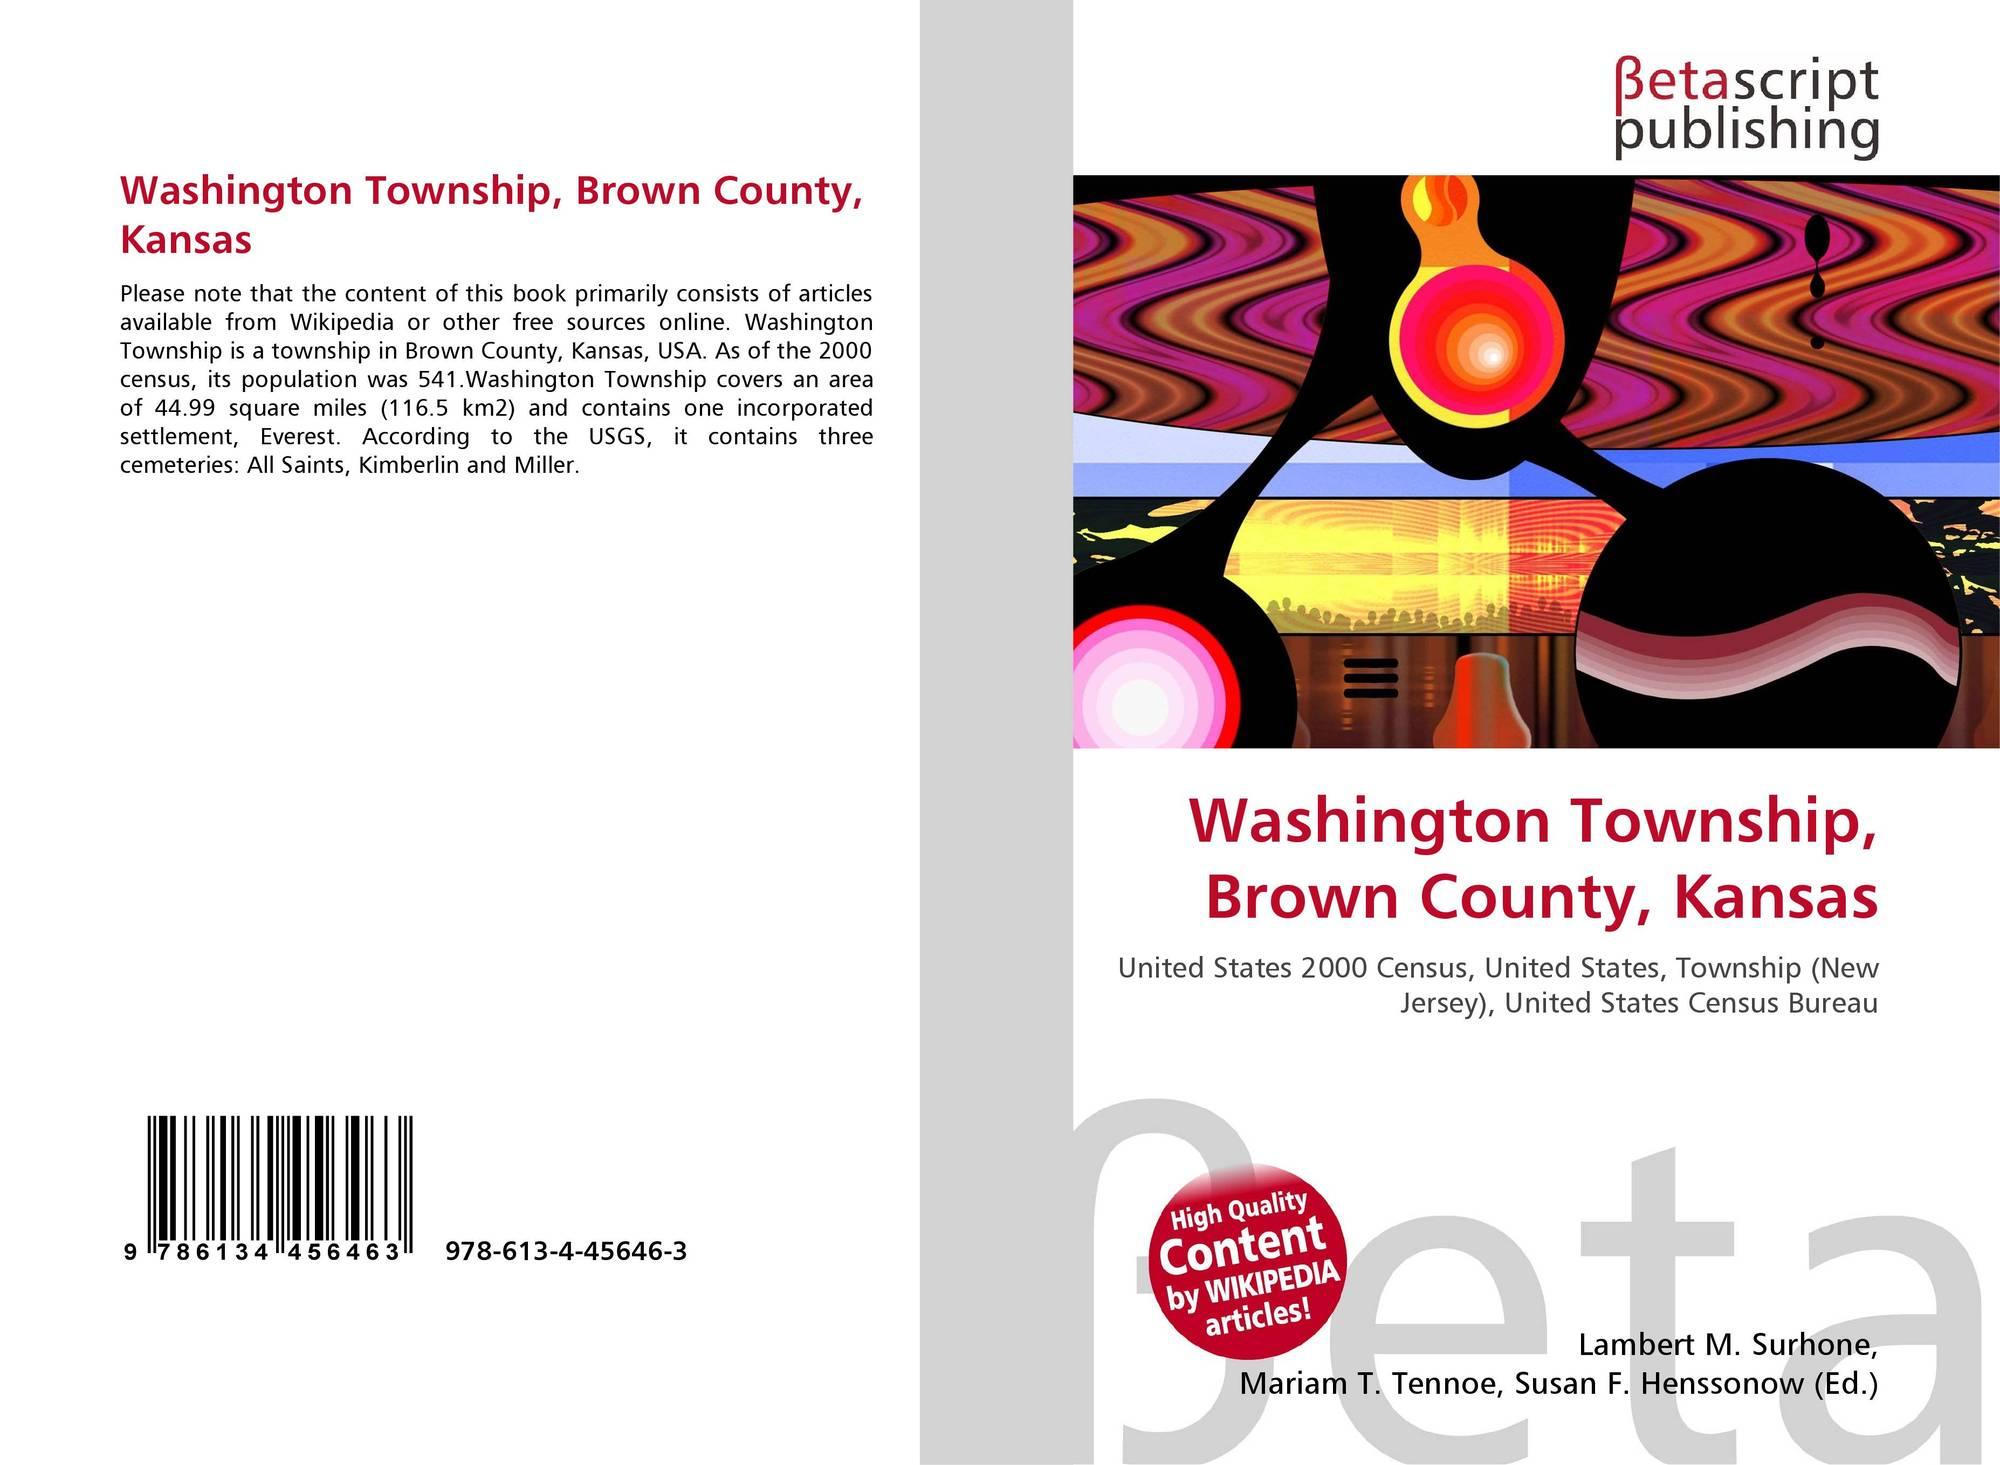 Kansas brown county everest - Bookcover Of Washington Township Brown County Kansas Omni Badge 9307e2201e5f762643a64561af3456be64a87707602f96b92ef18a9bbcada116